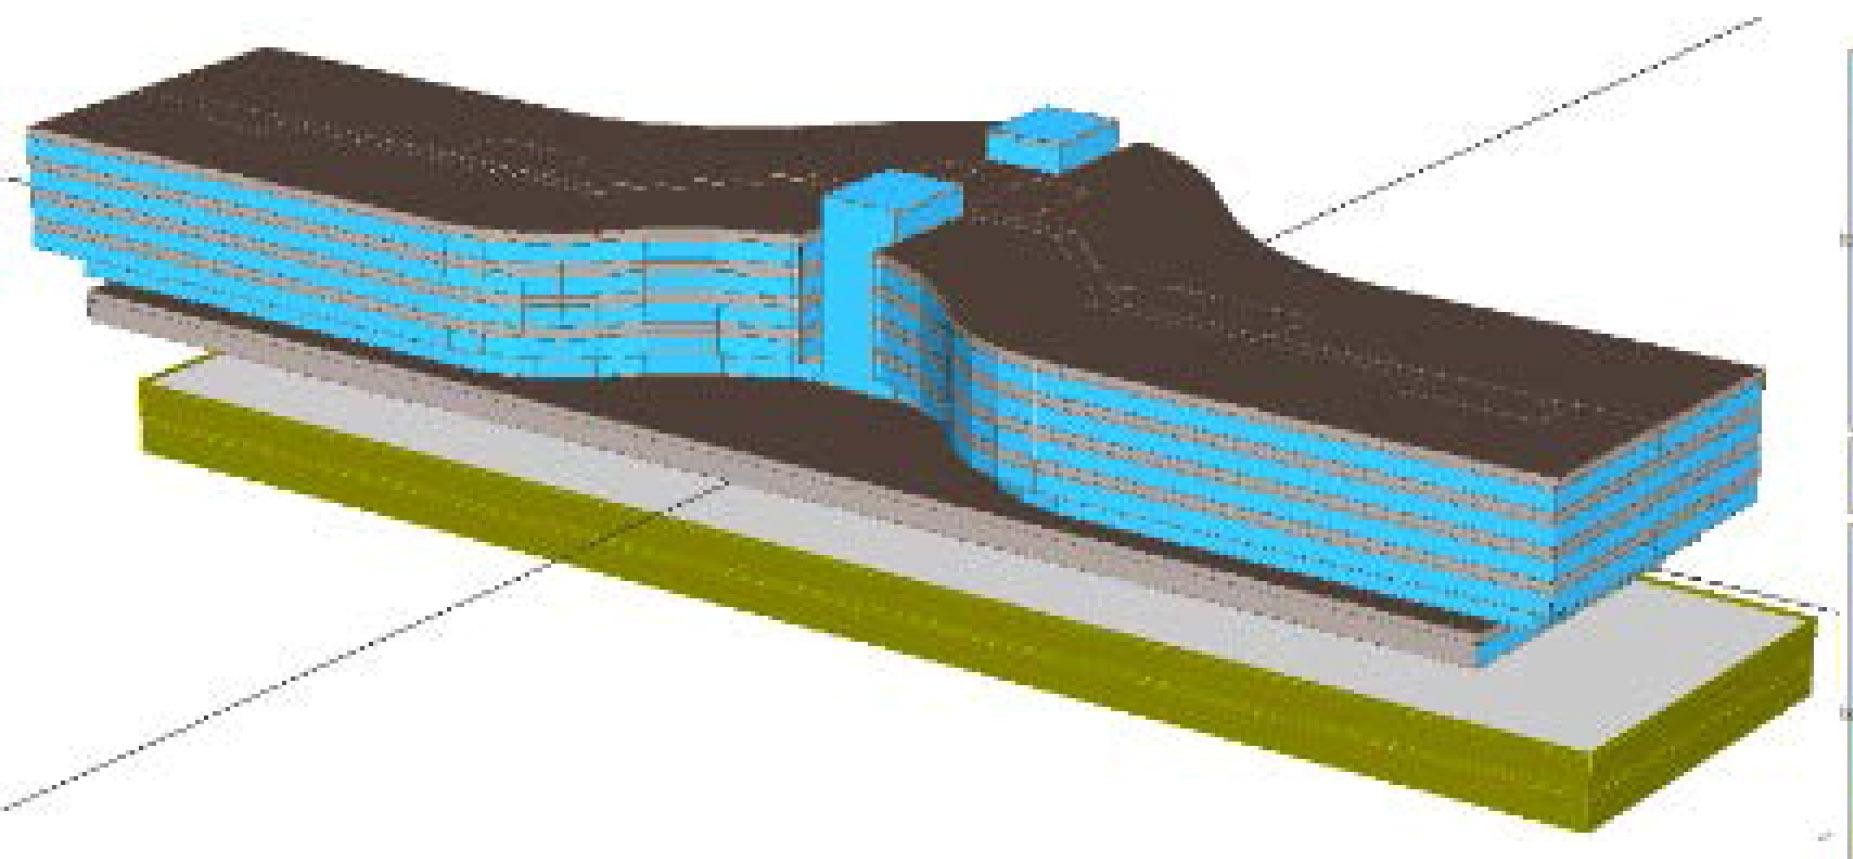 TGE_Energy Modeling Image_eQuest.jpg